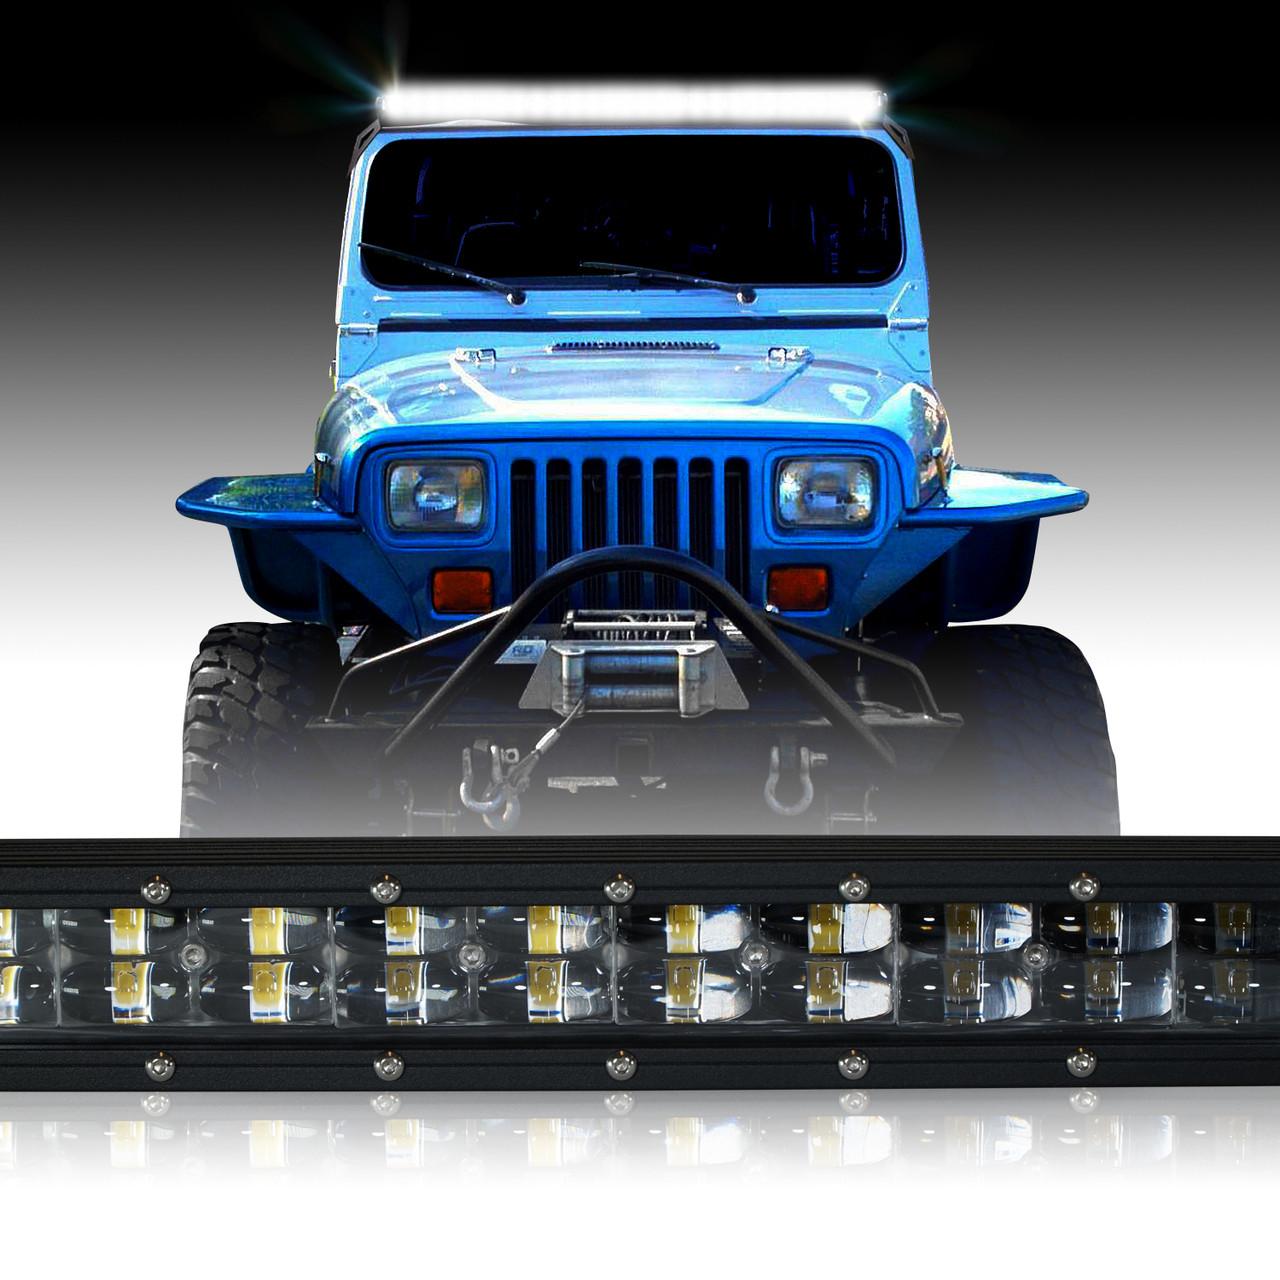 2004 Jeep Tj Hardtop Wiring Explained Diagrams Harness 1995 Wrangler Download U2022 40